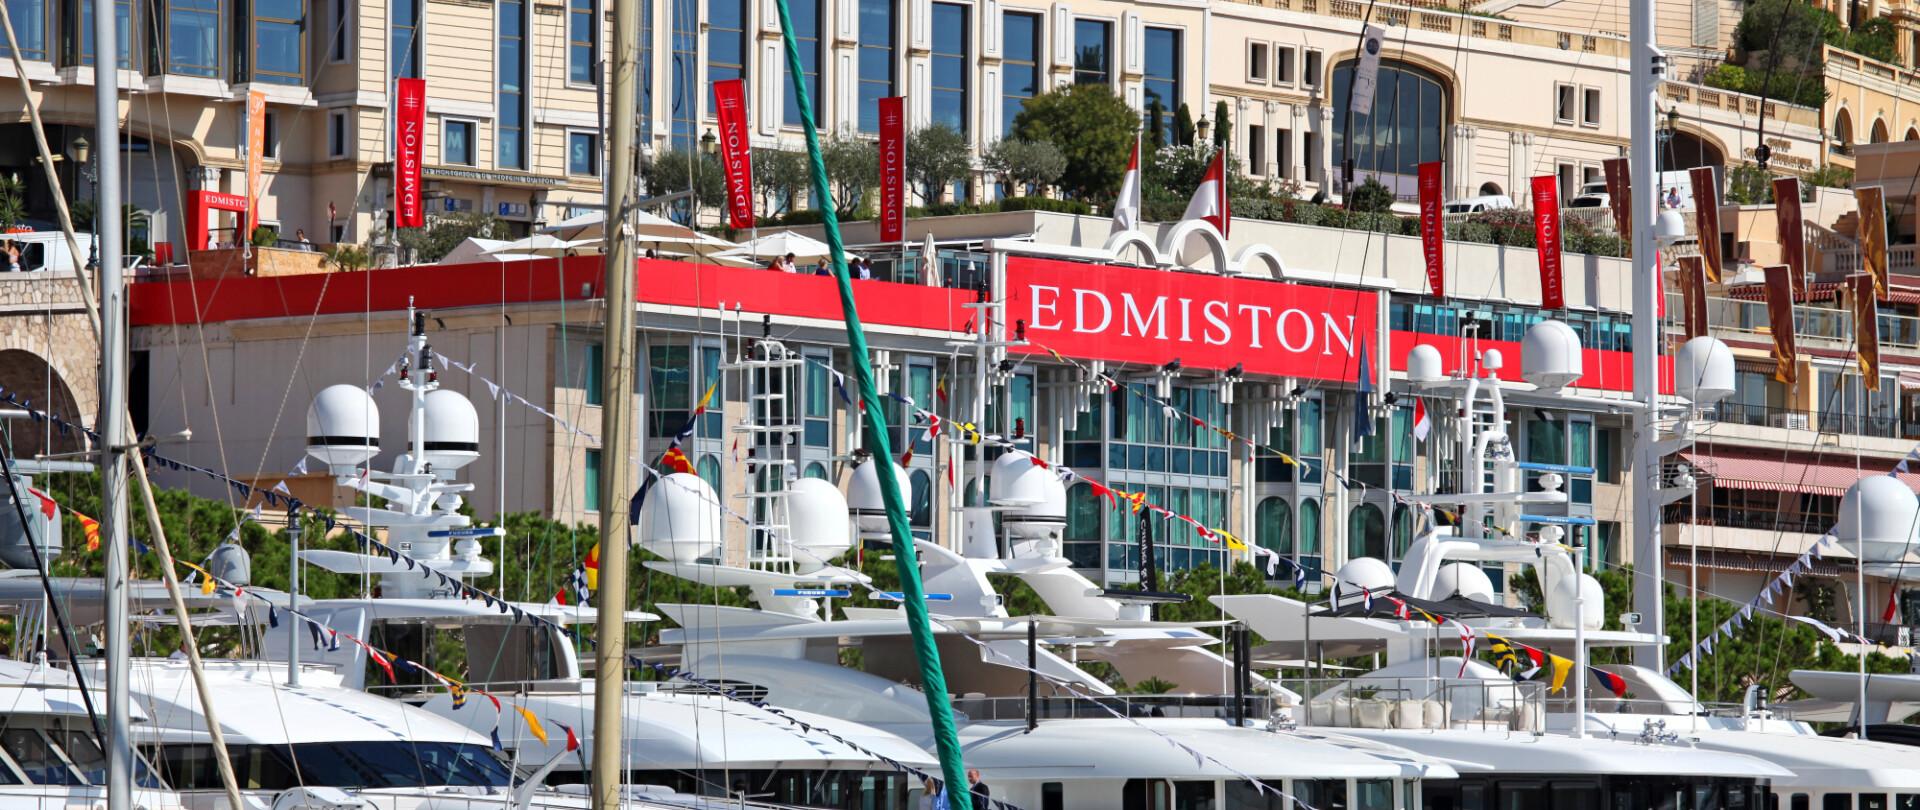 Monaco Yacht Show 2013 photo 1